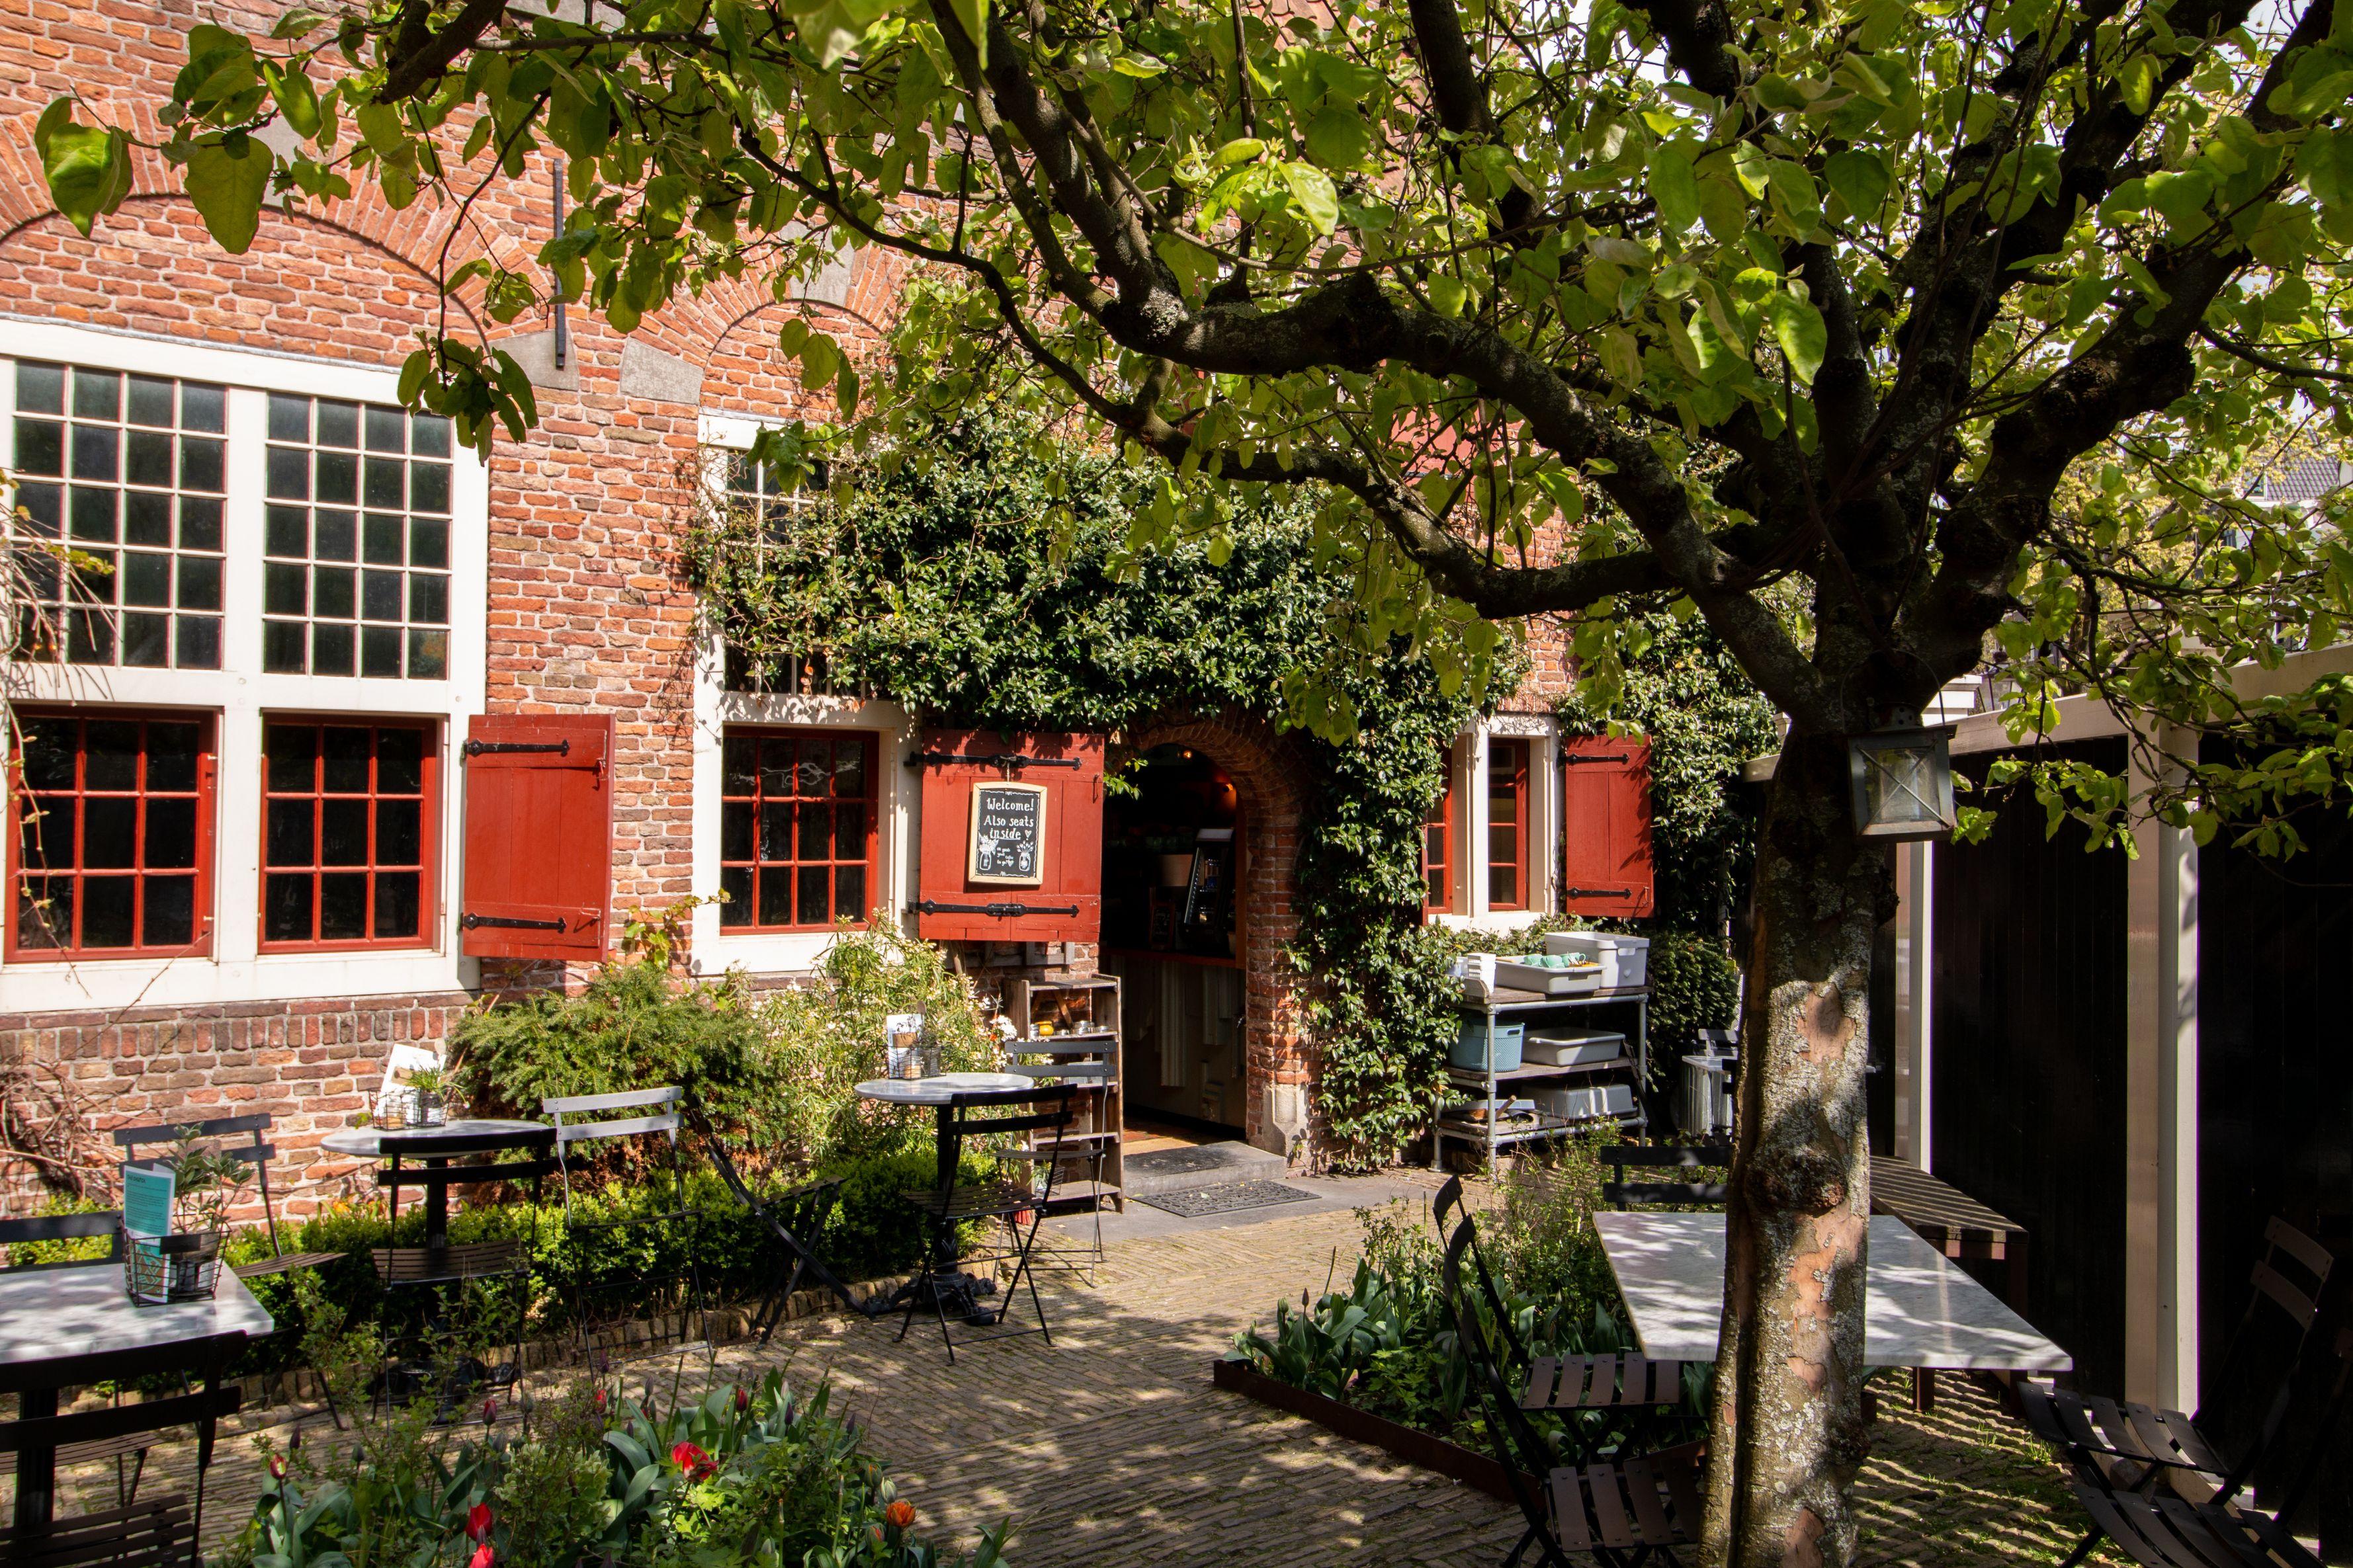 De Koffieschenkerij - Coffee café in Amsterdam - Garden